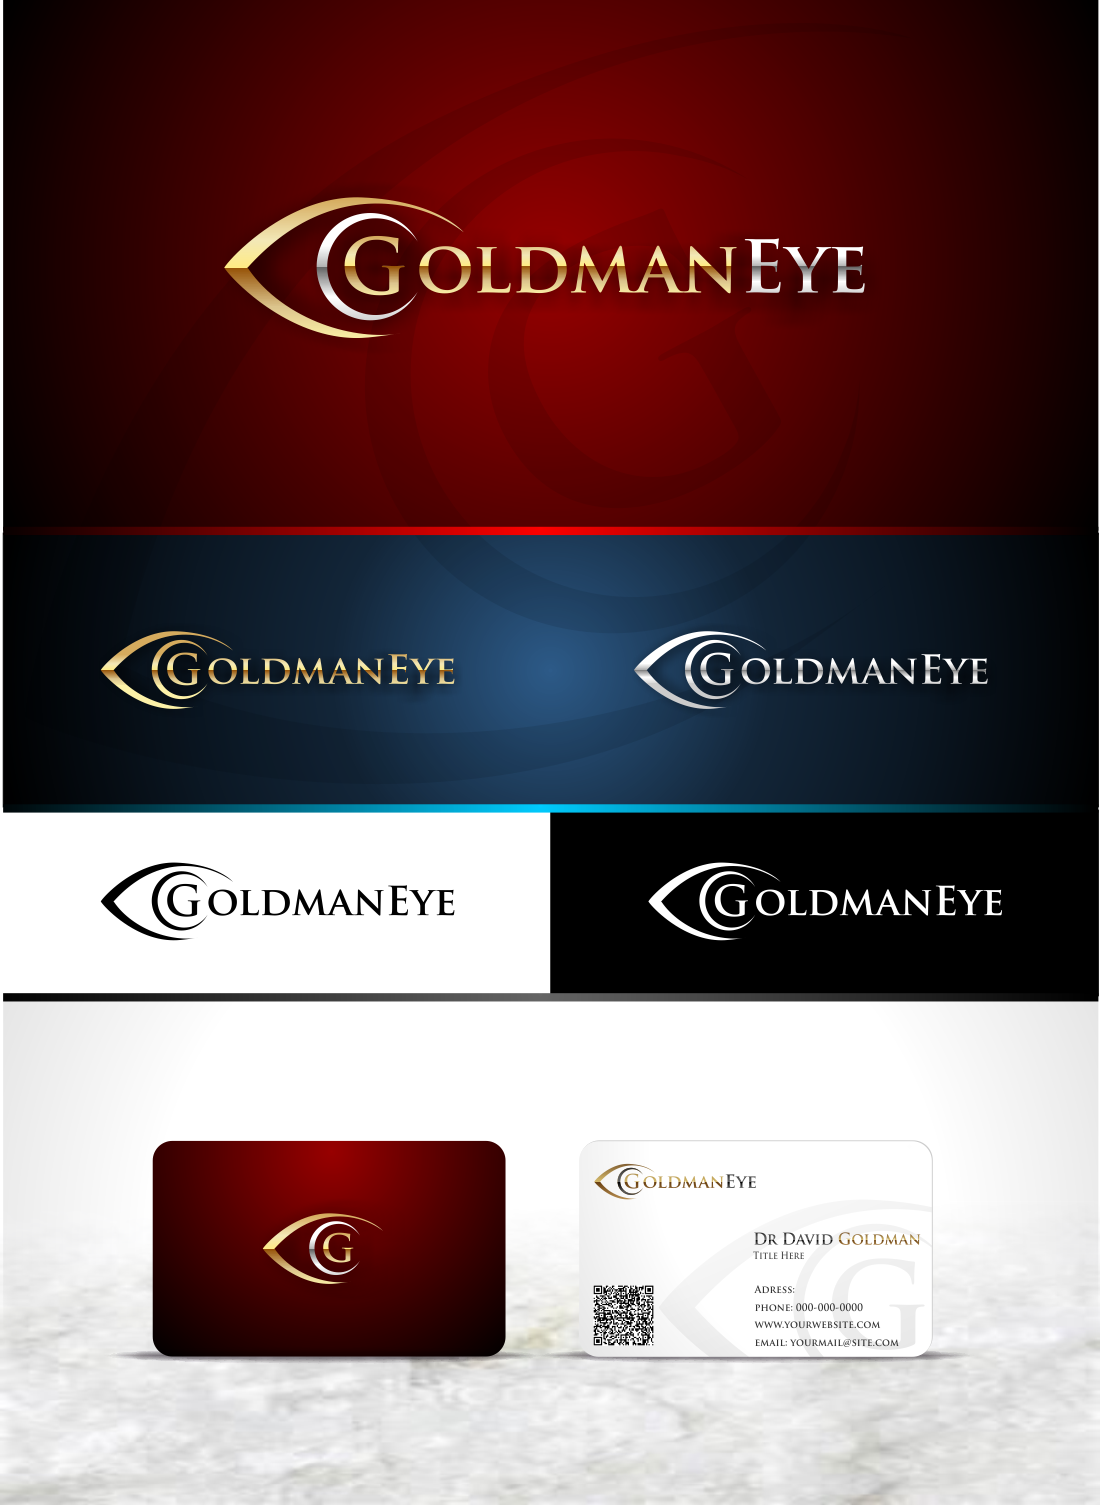 Help Goldman Eye with a new logo